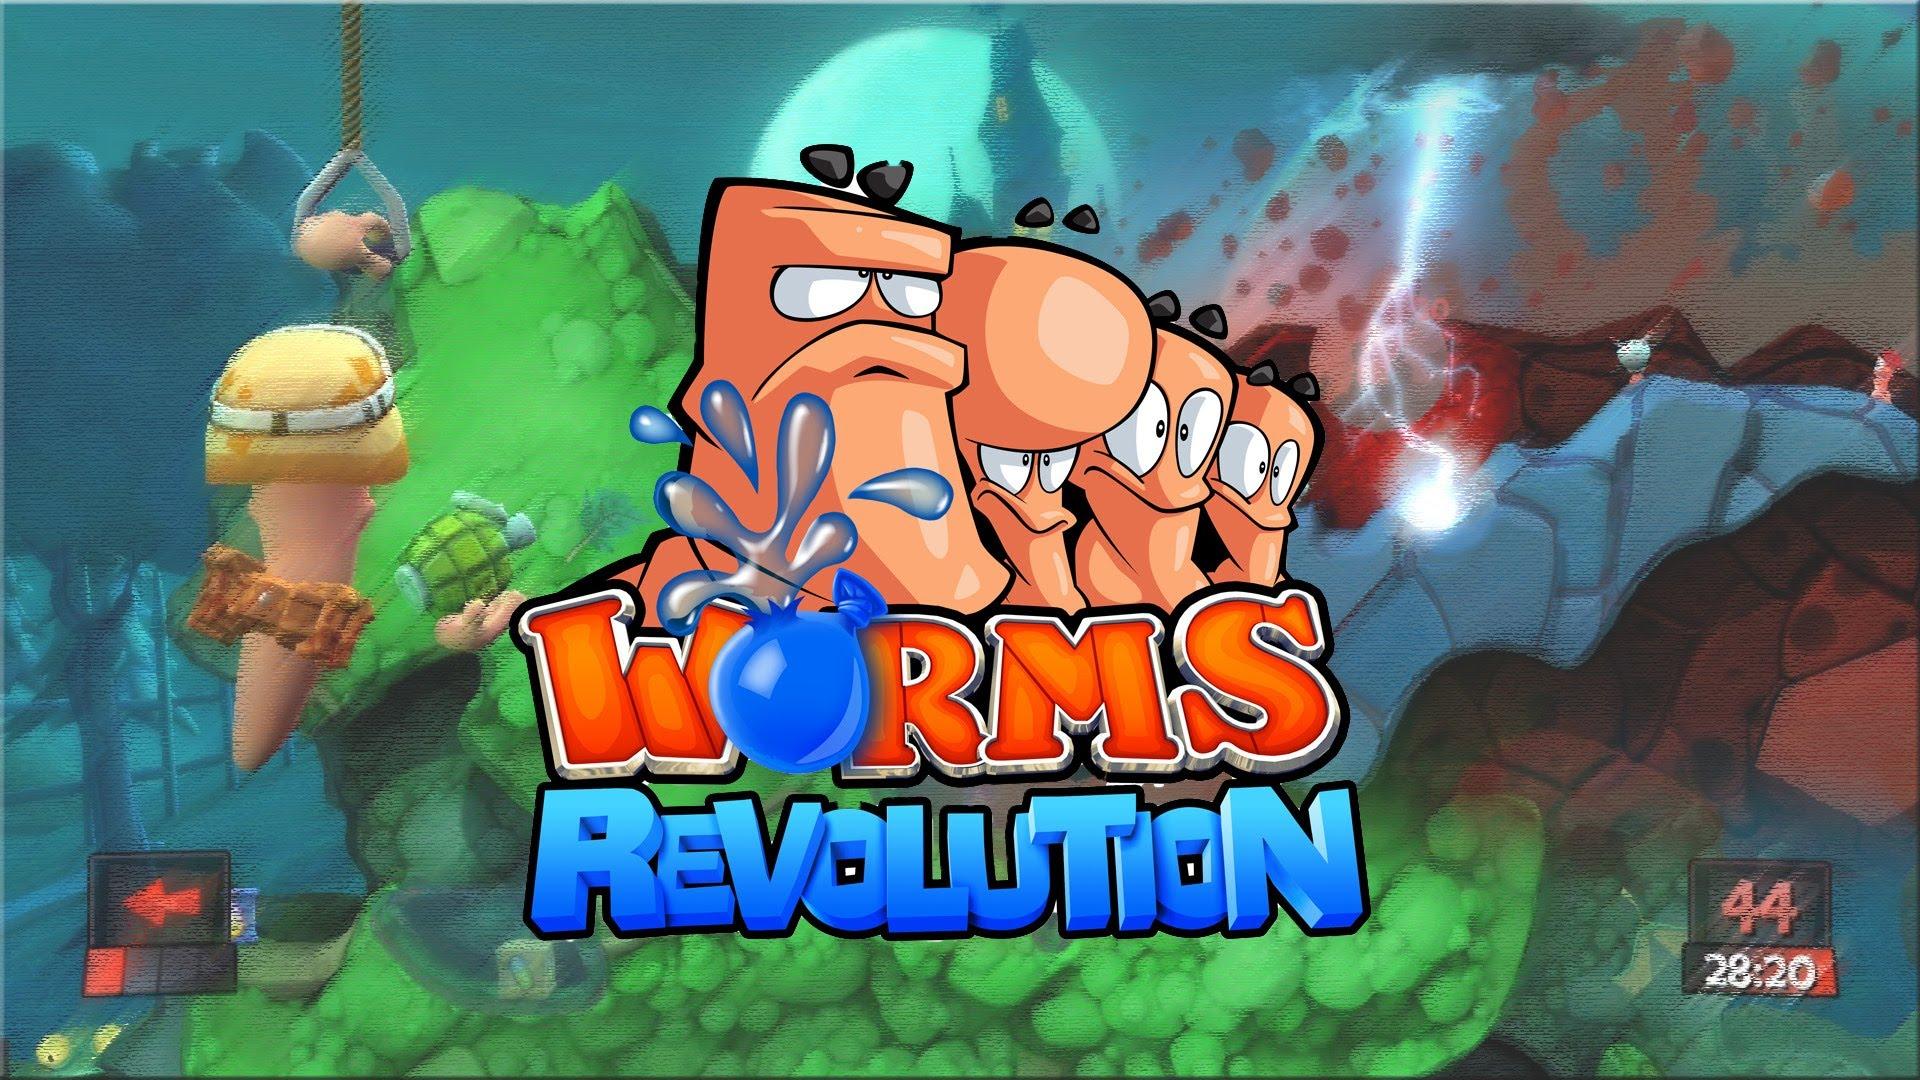 worms revolutino